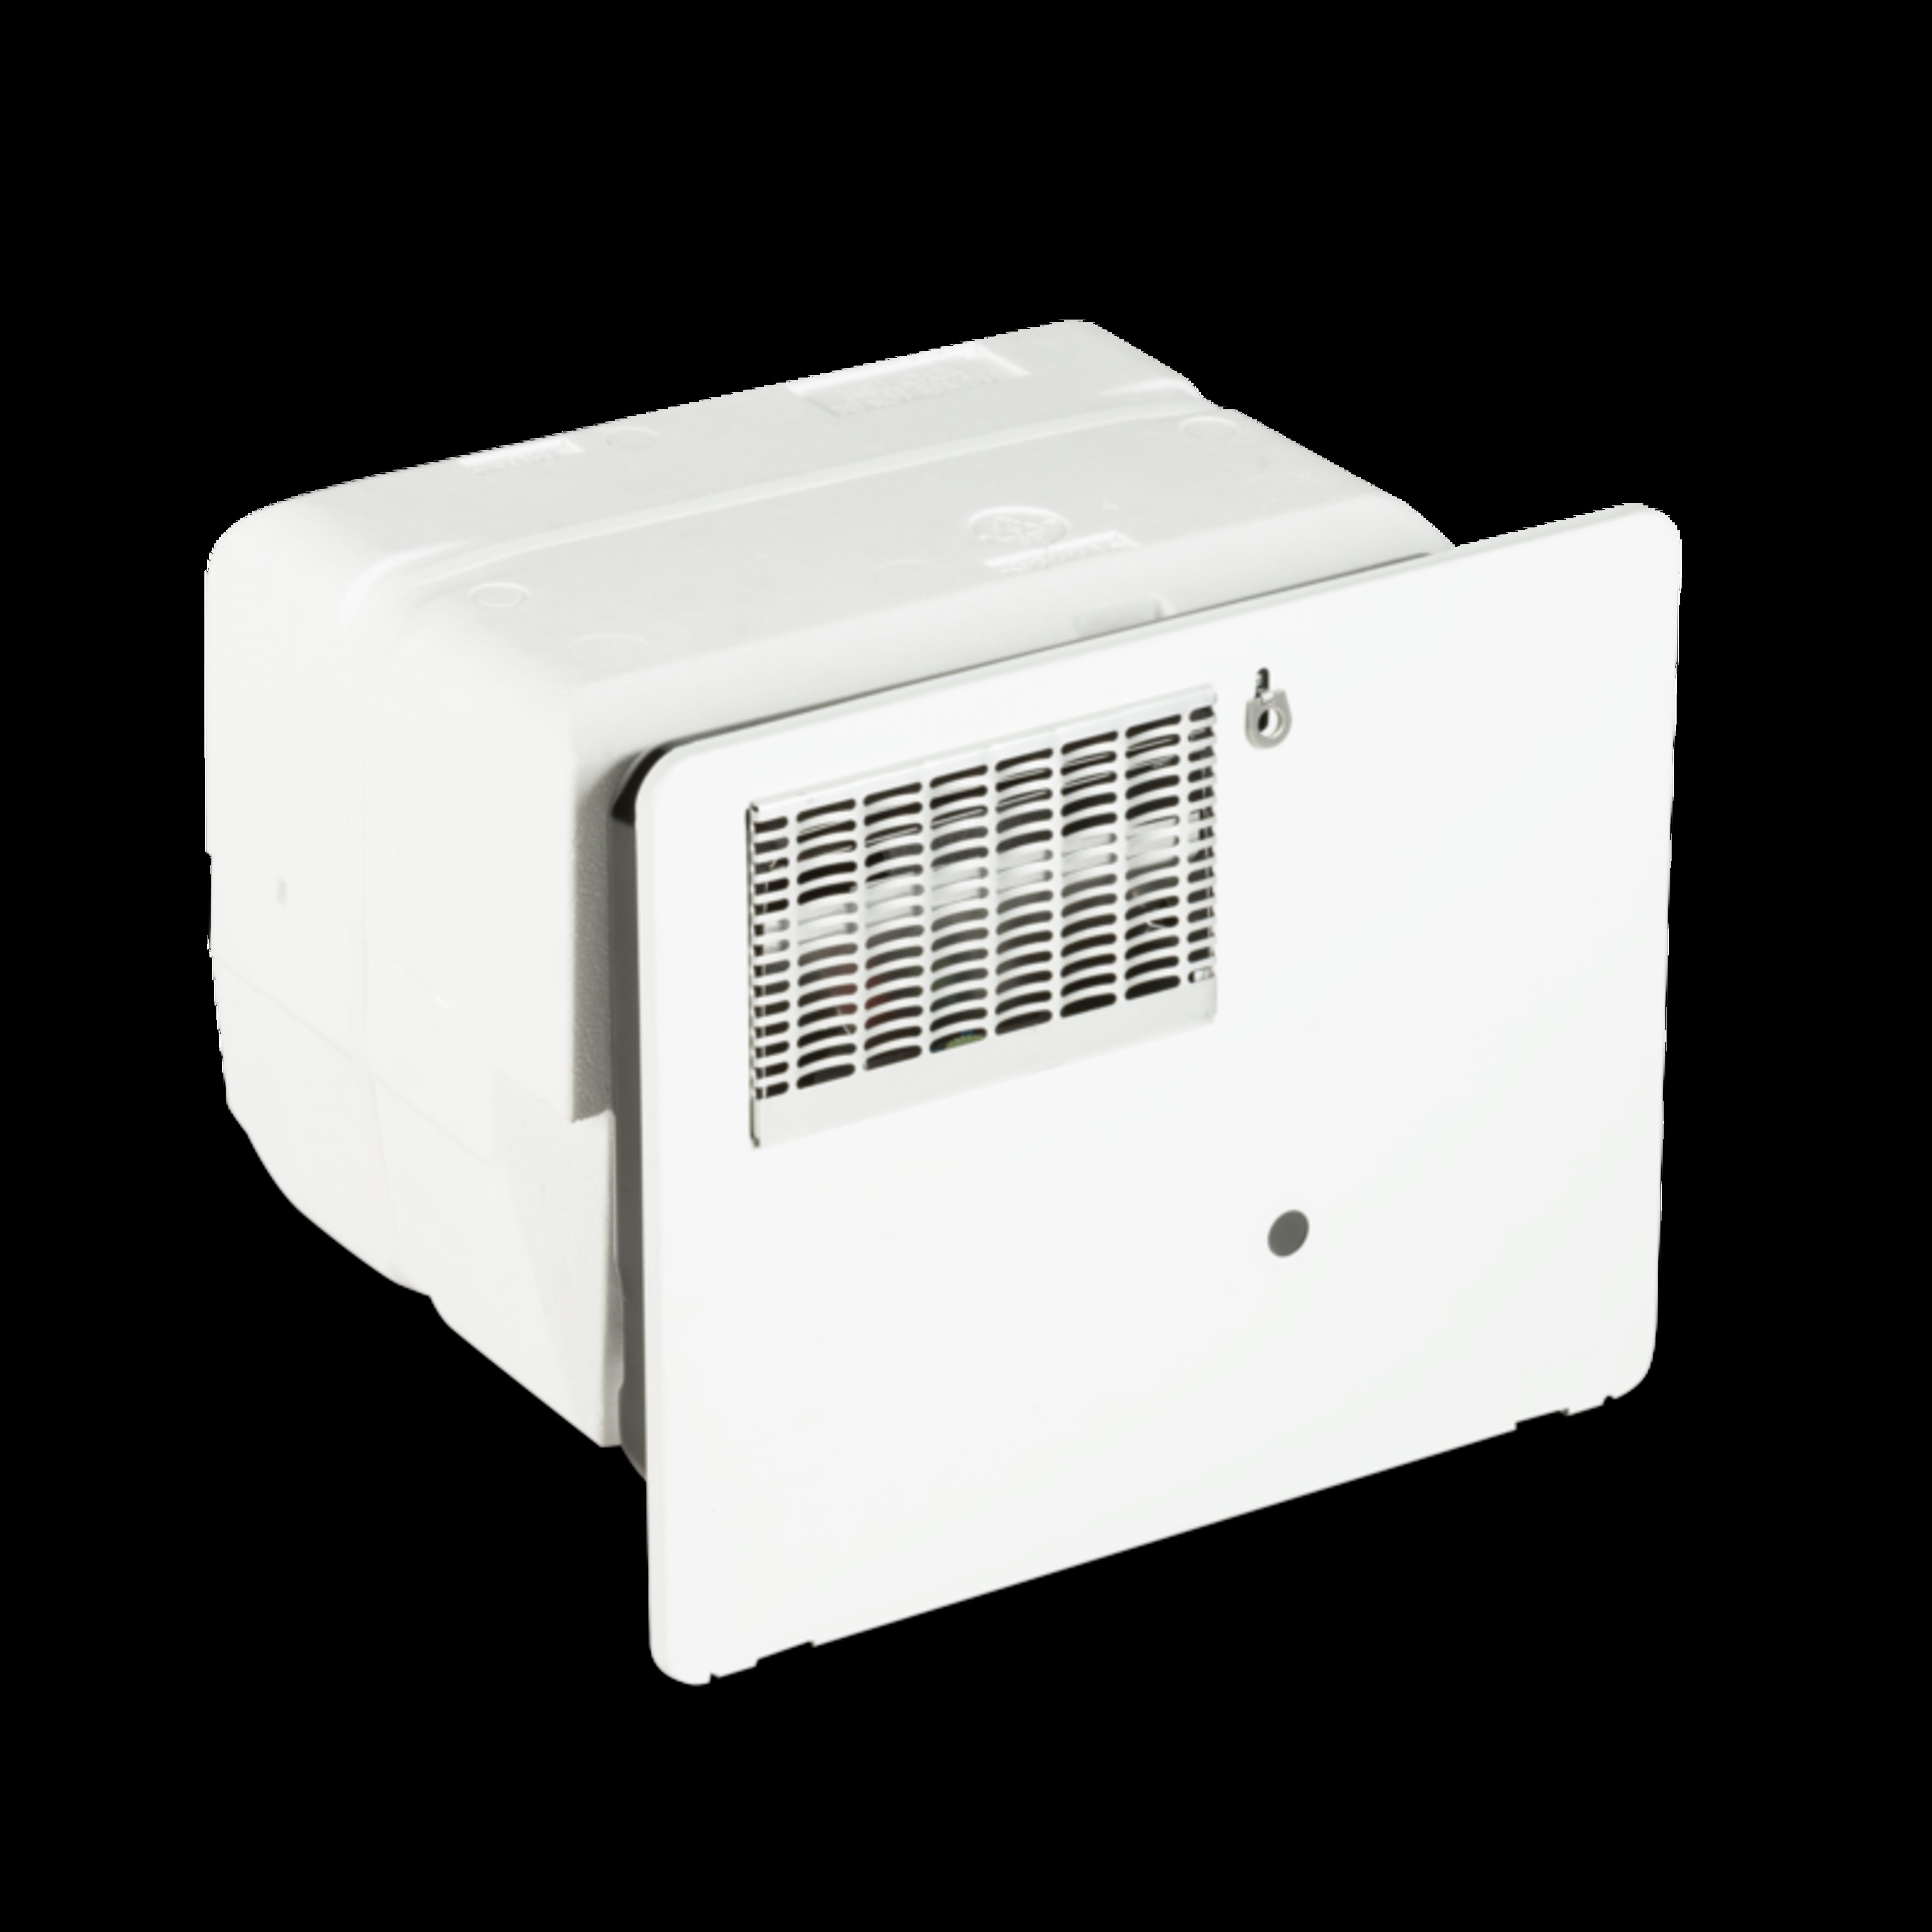 Dometic XT Water Heater